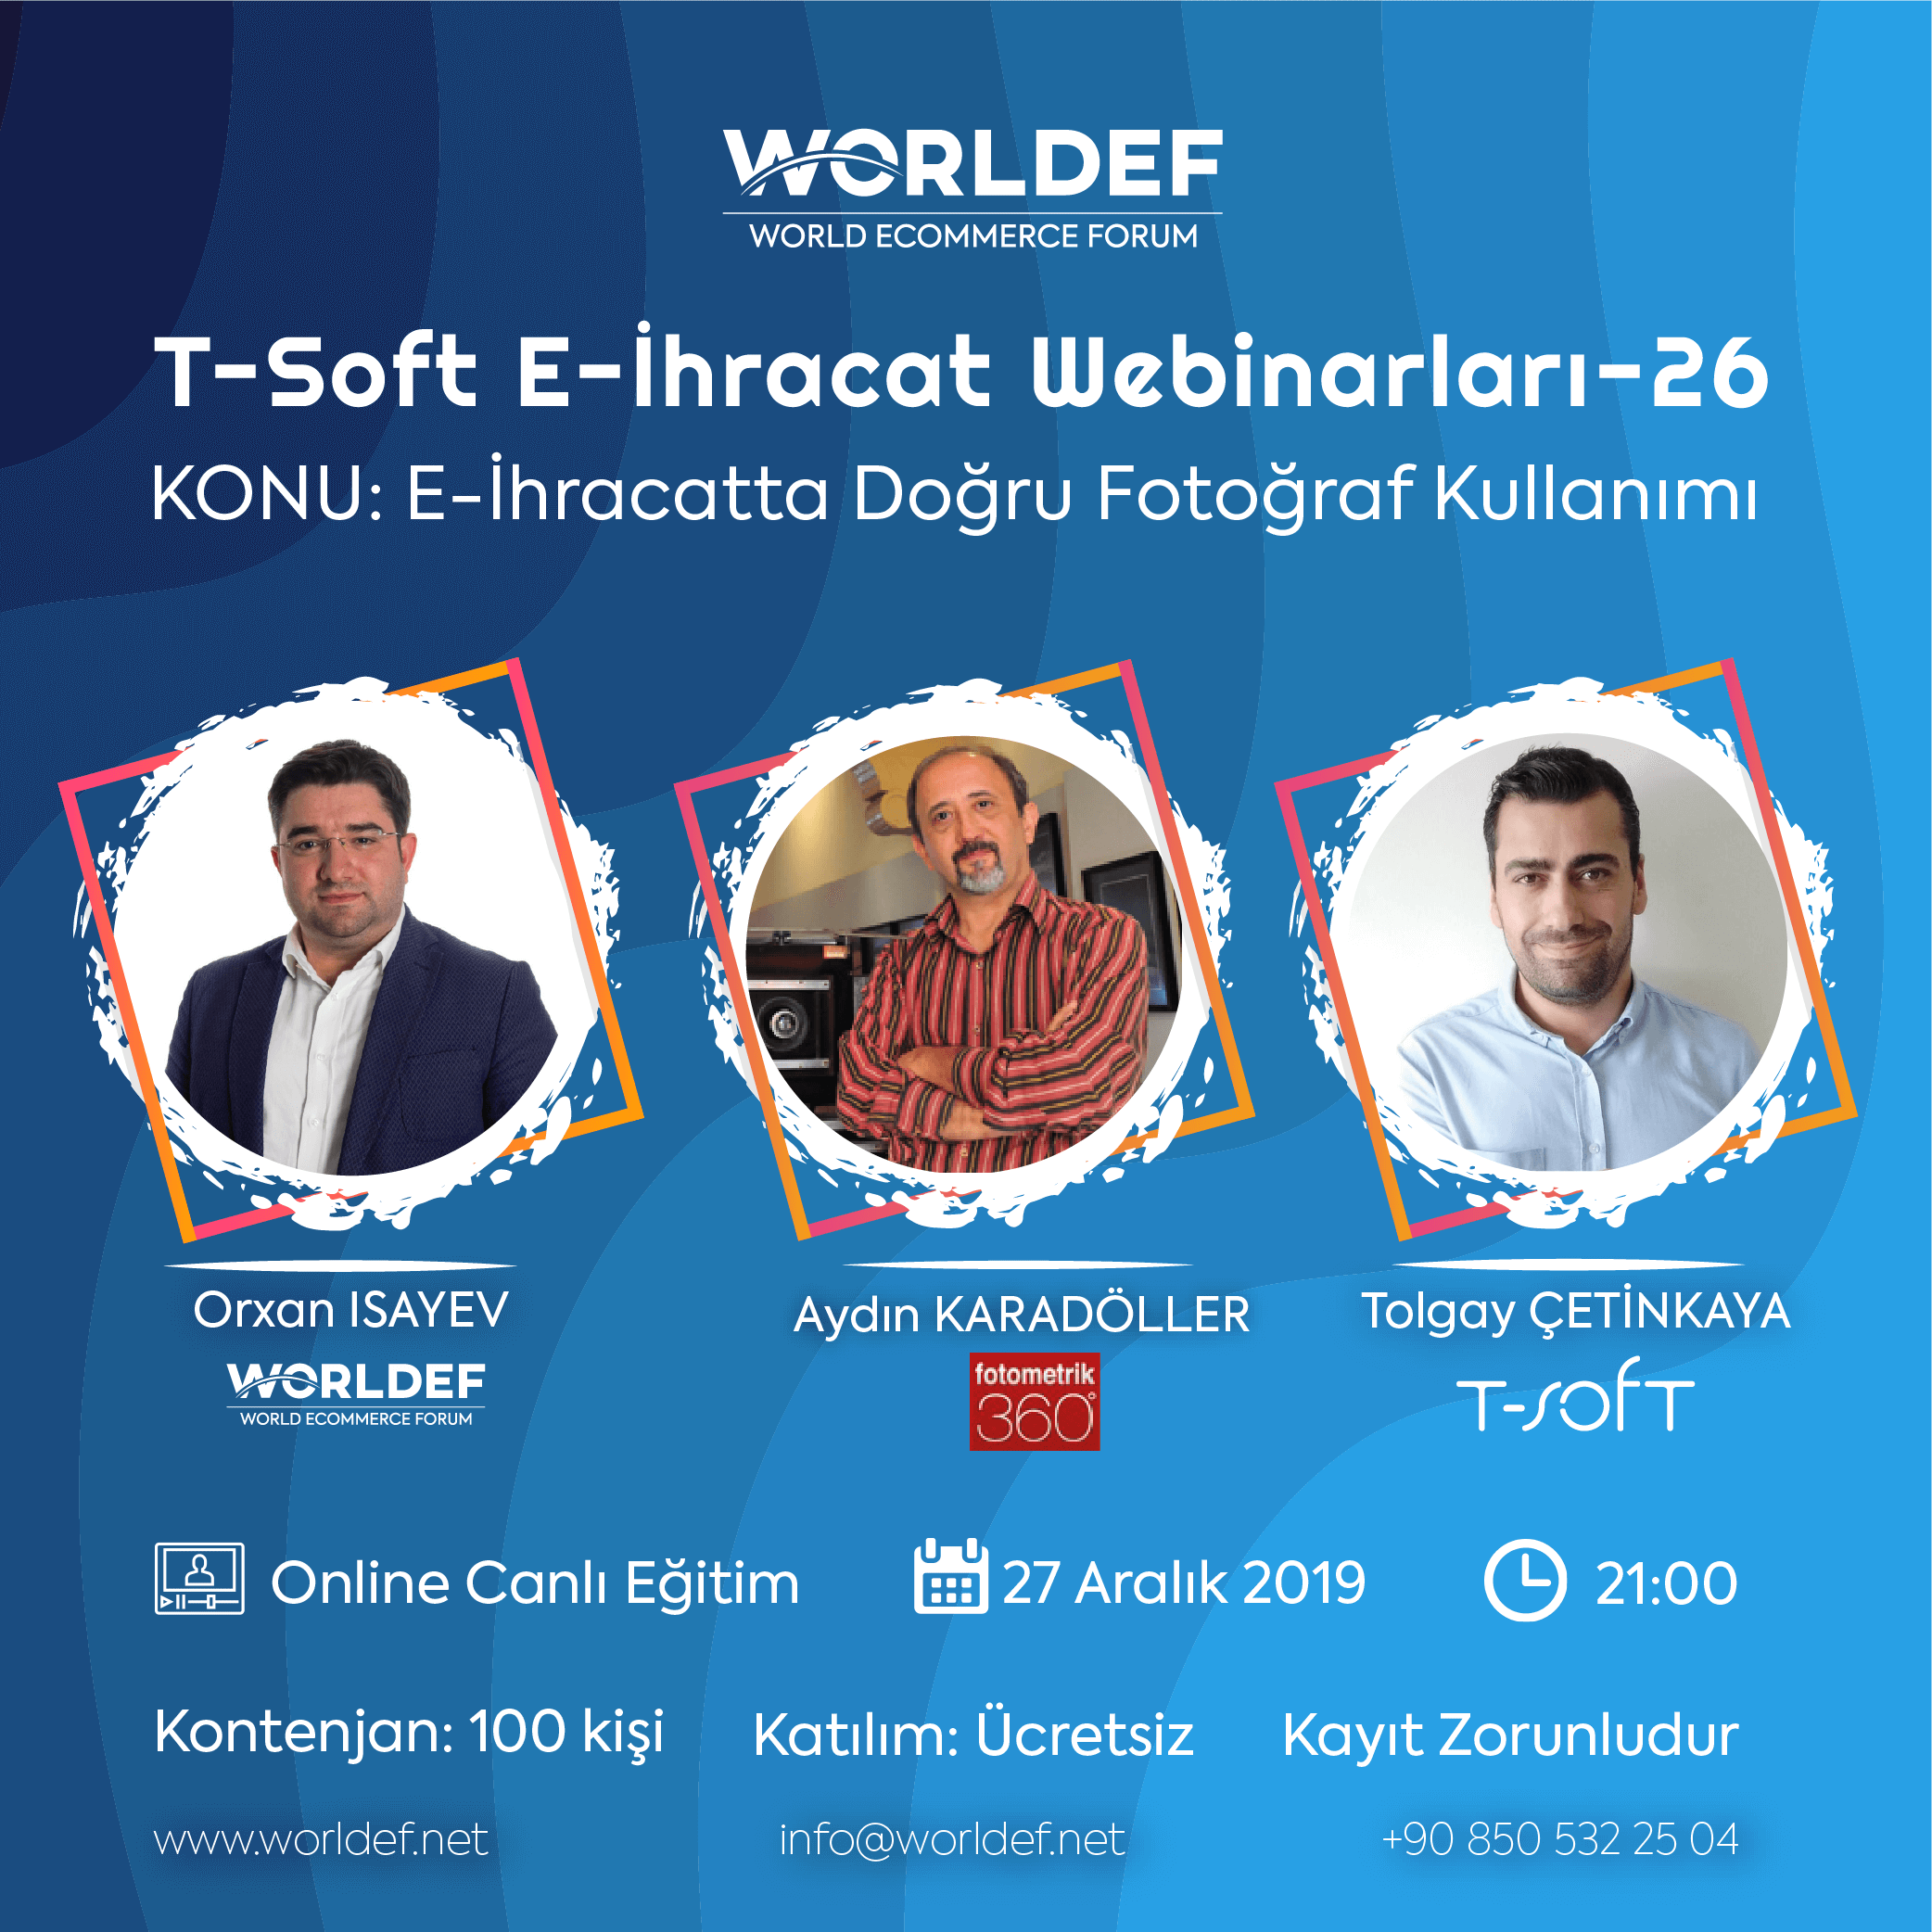 In the last cross-border e-commerce webinar week of 2019, Aydın Karadöller, the founding partner of Fotometrik360, will be our guest.